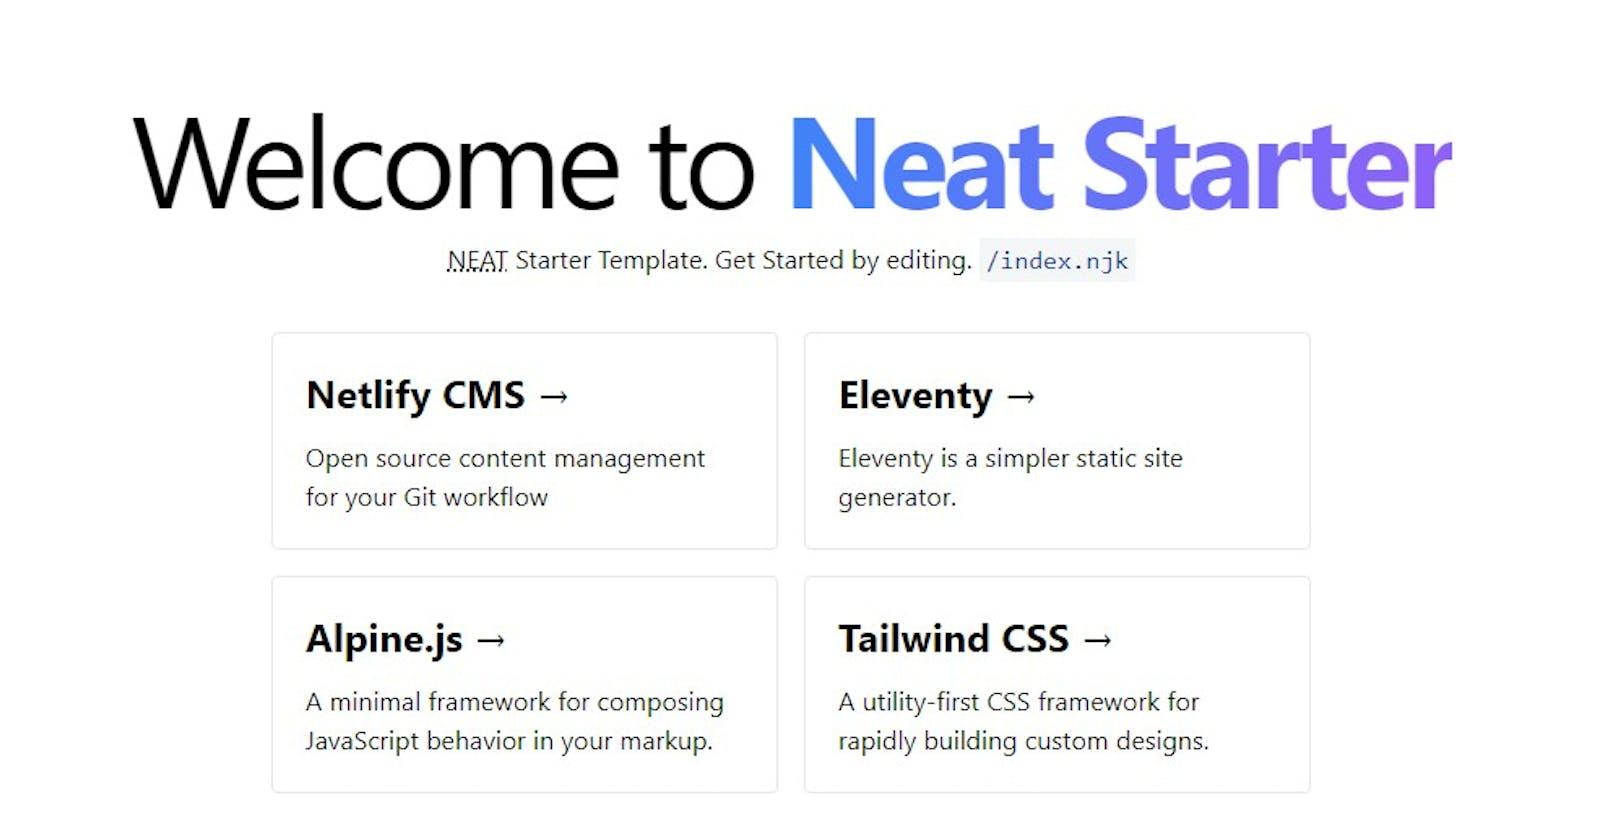 NEAT Stack: Create a Static Website with Netlify CMS, Eleventy, AlpineJS & TailwindCSS